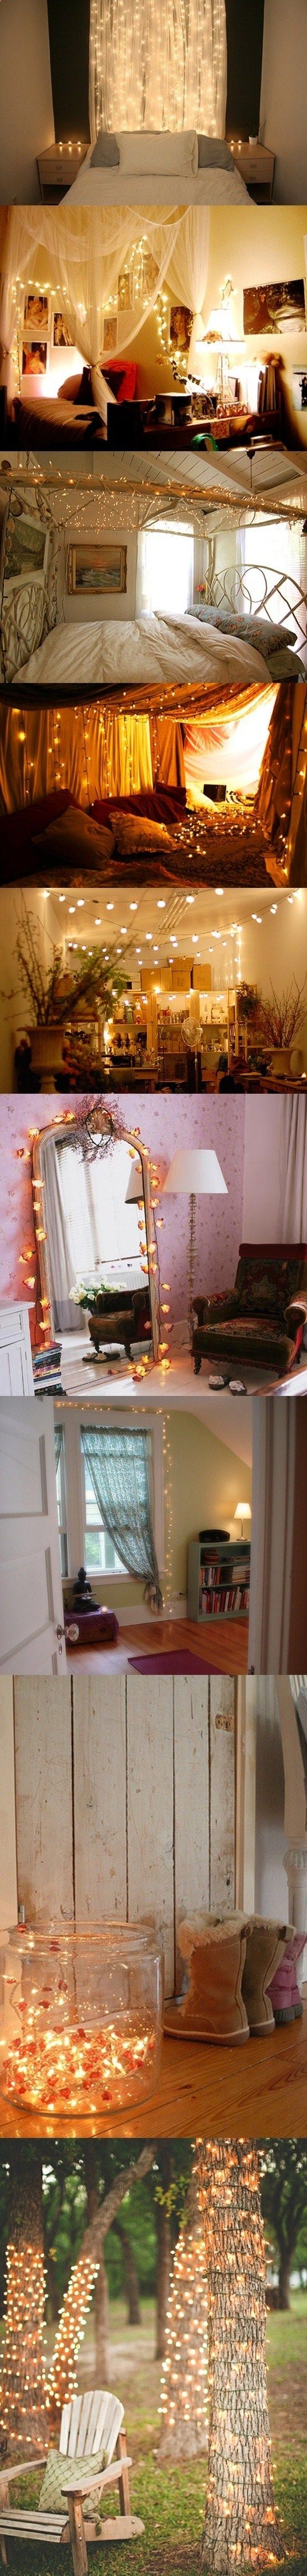 lights | poshhome.info